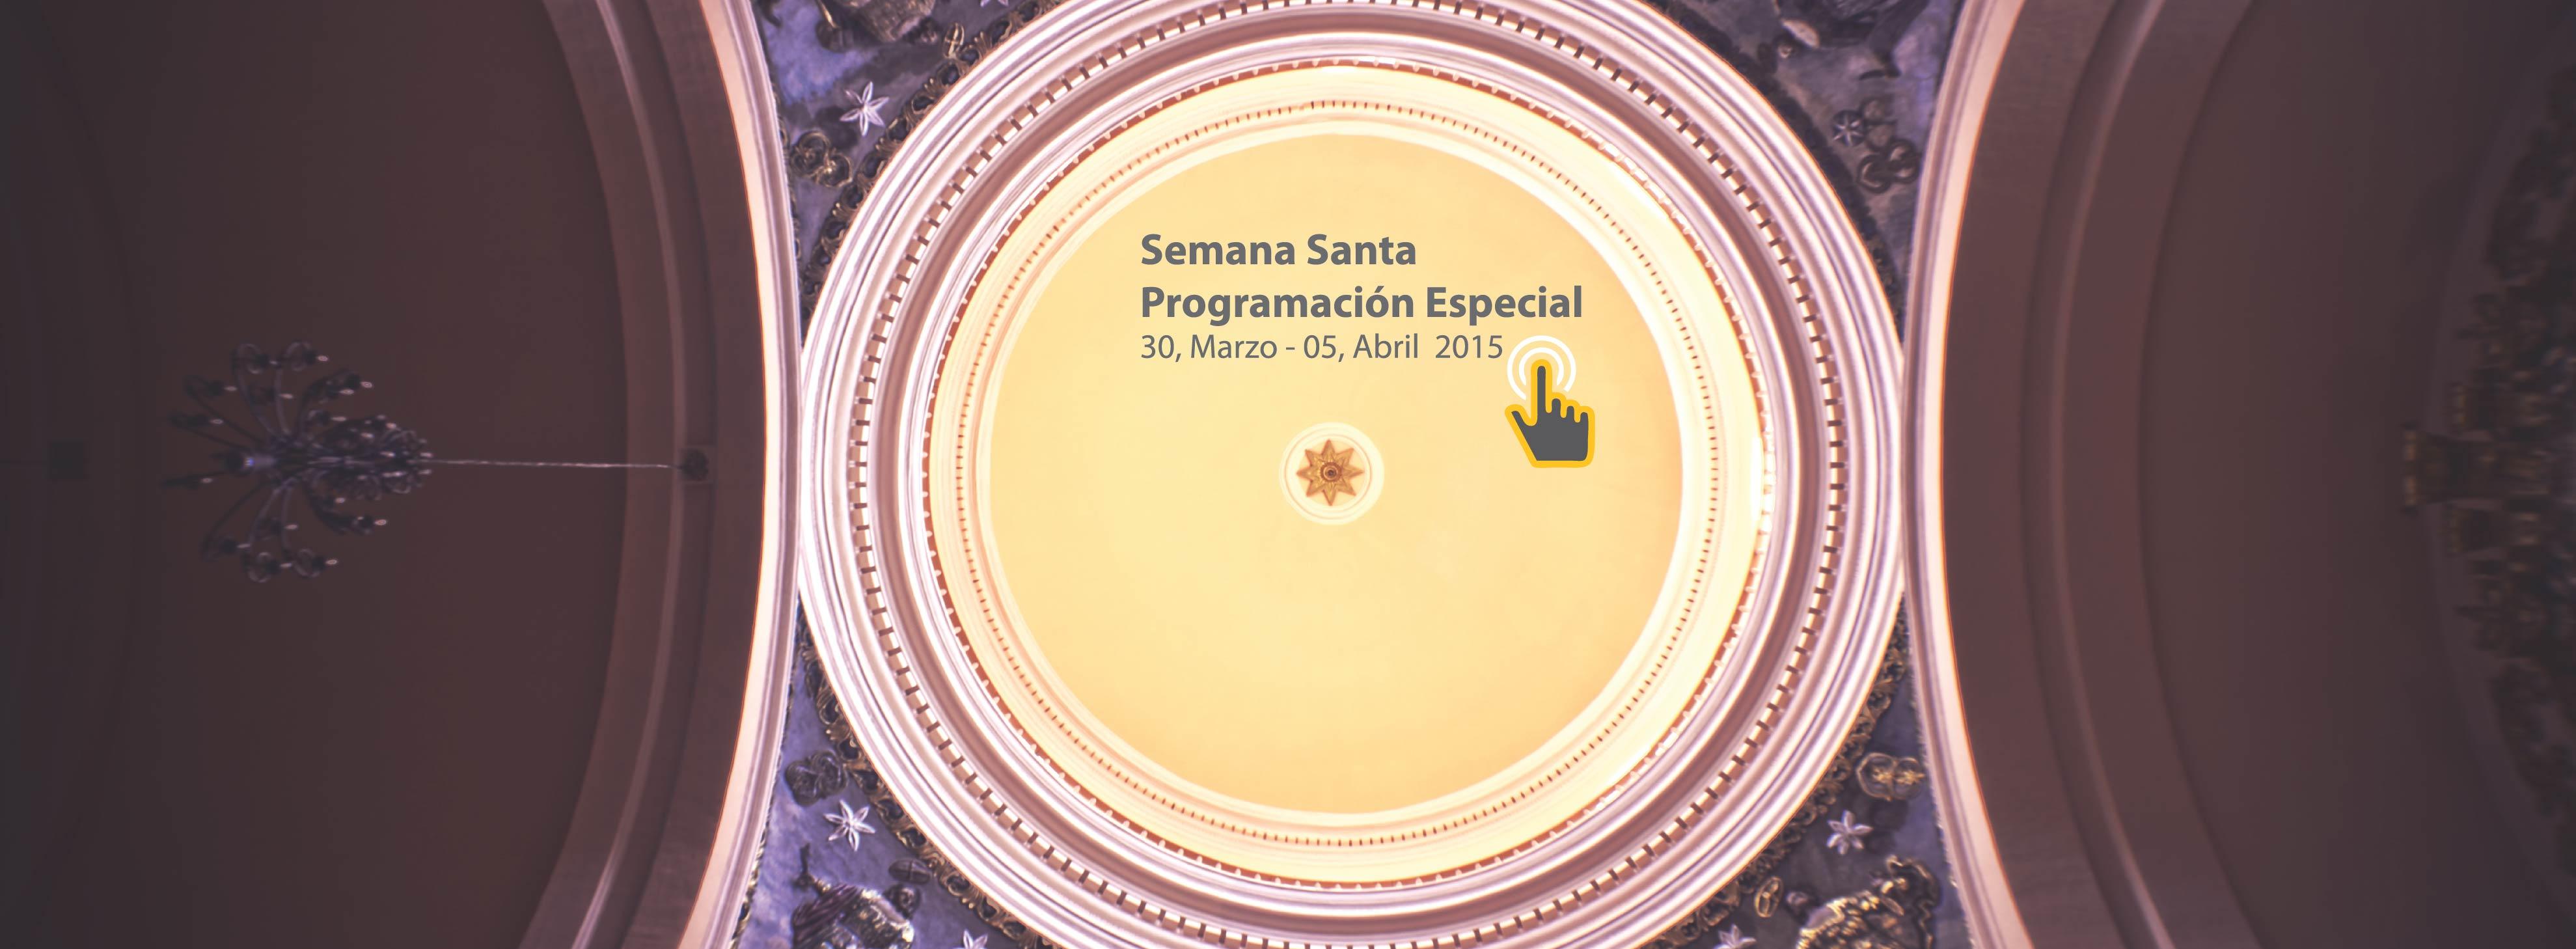 formato-web-home-slide-ssemana-st